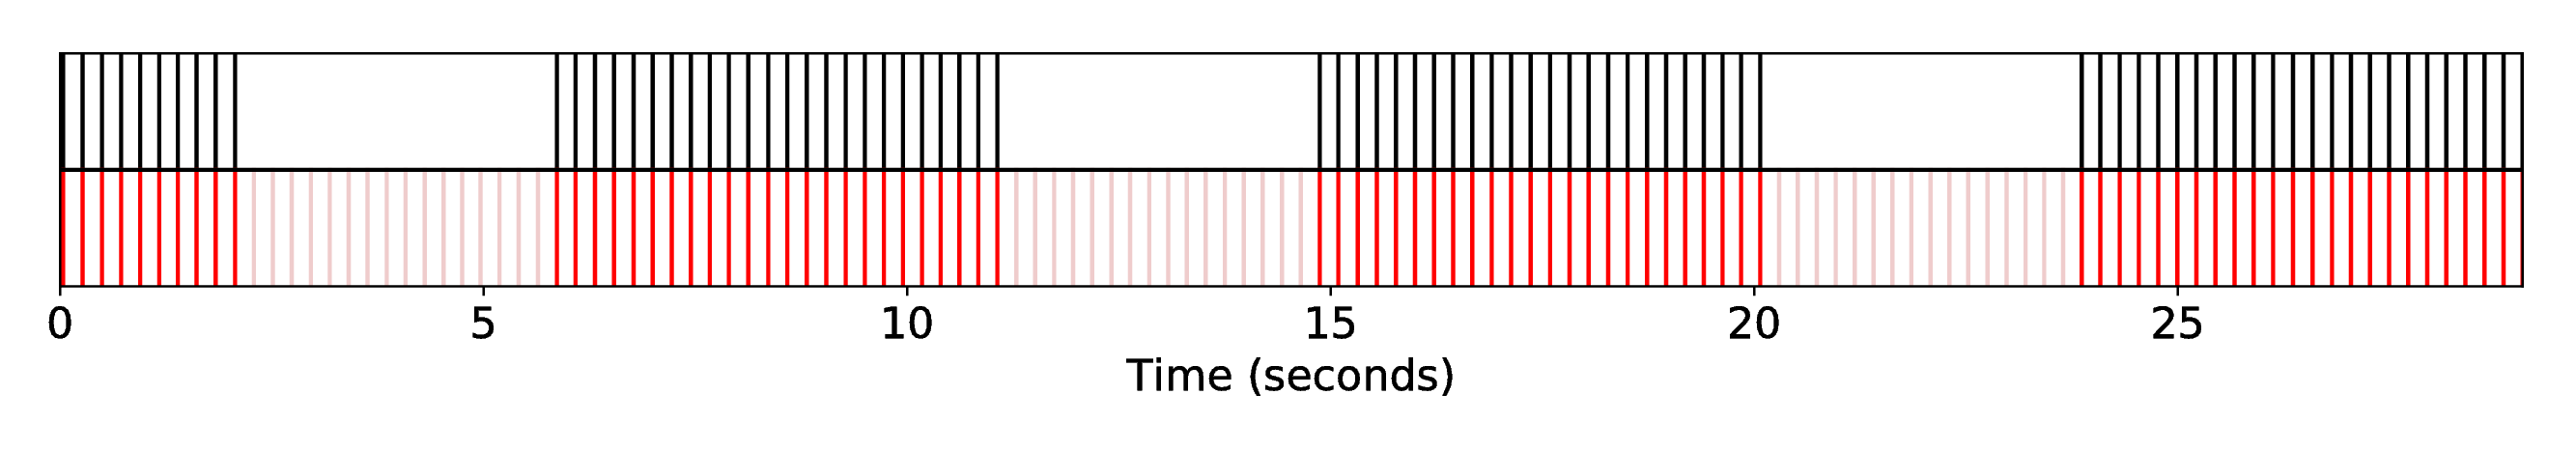 DP1_INT1_R-MRI-06__S-Broke__SequenceAlignment